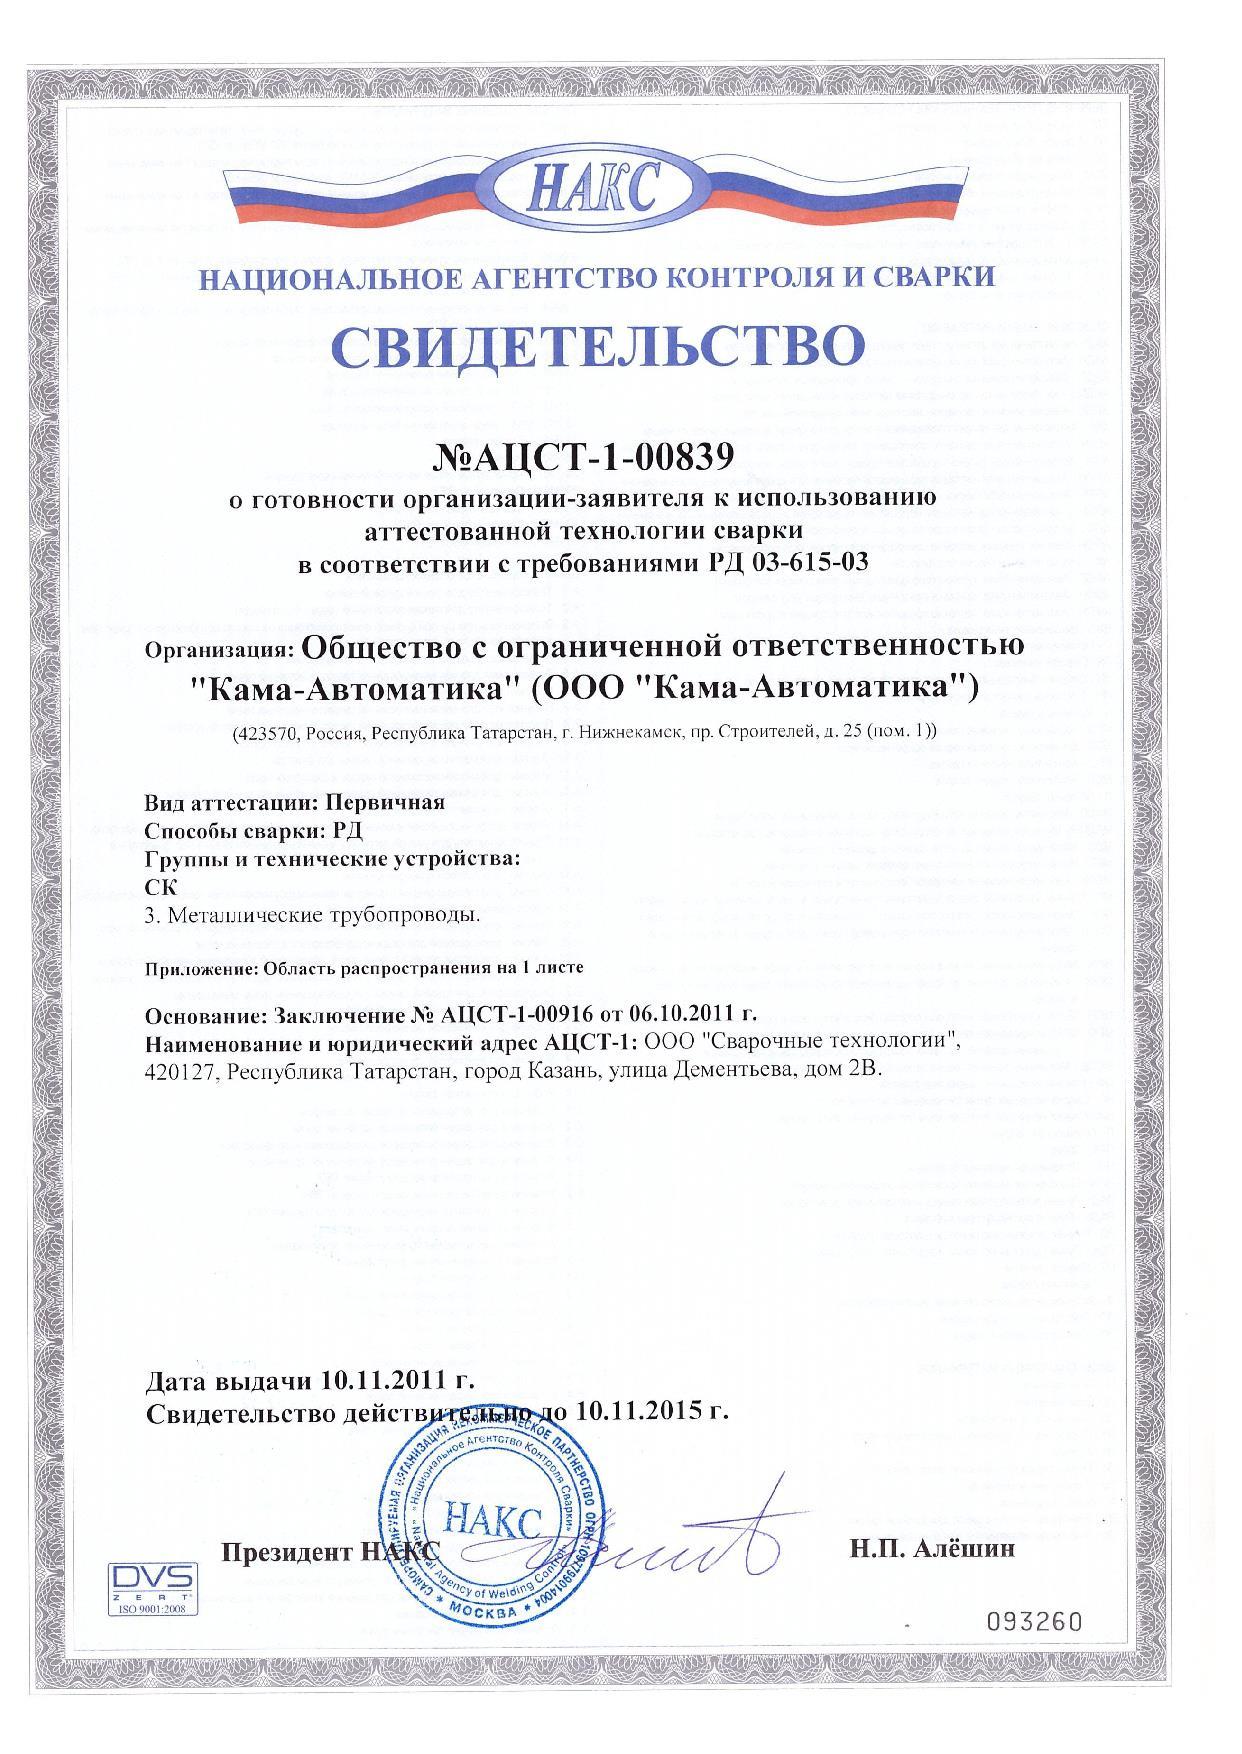 trans-inzhiniring-grupp